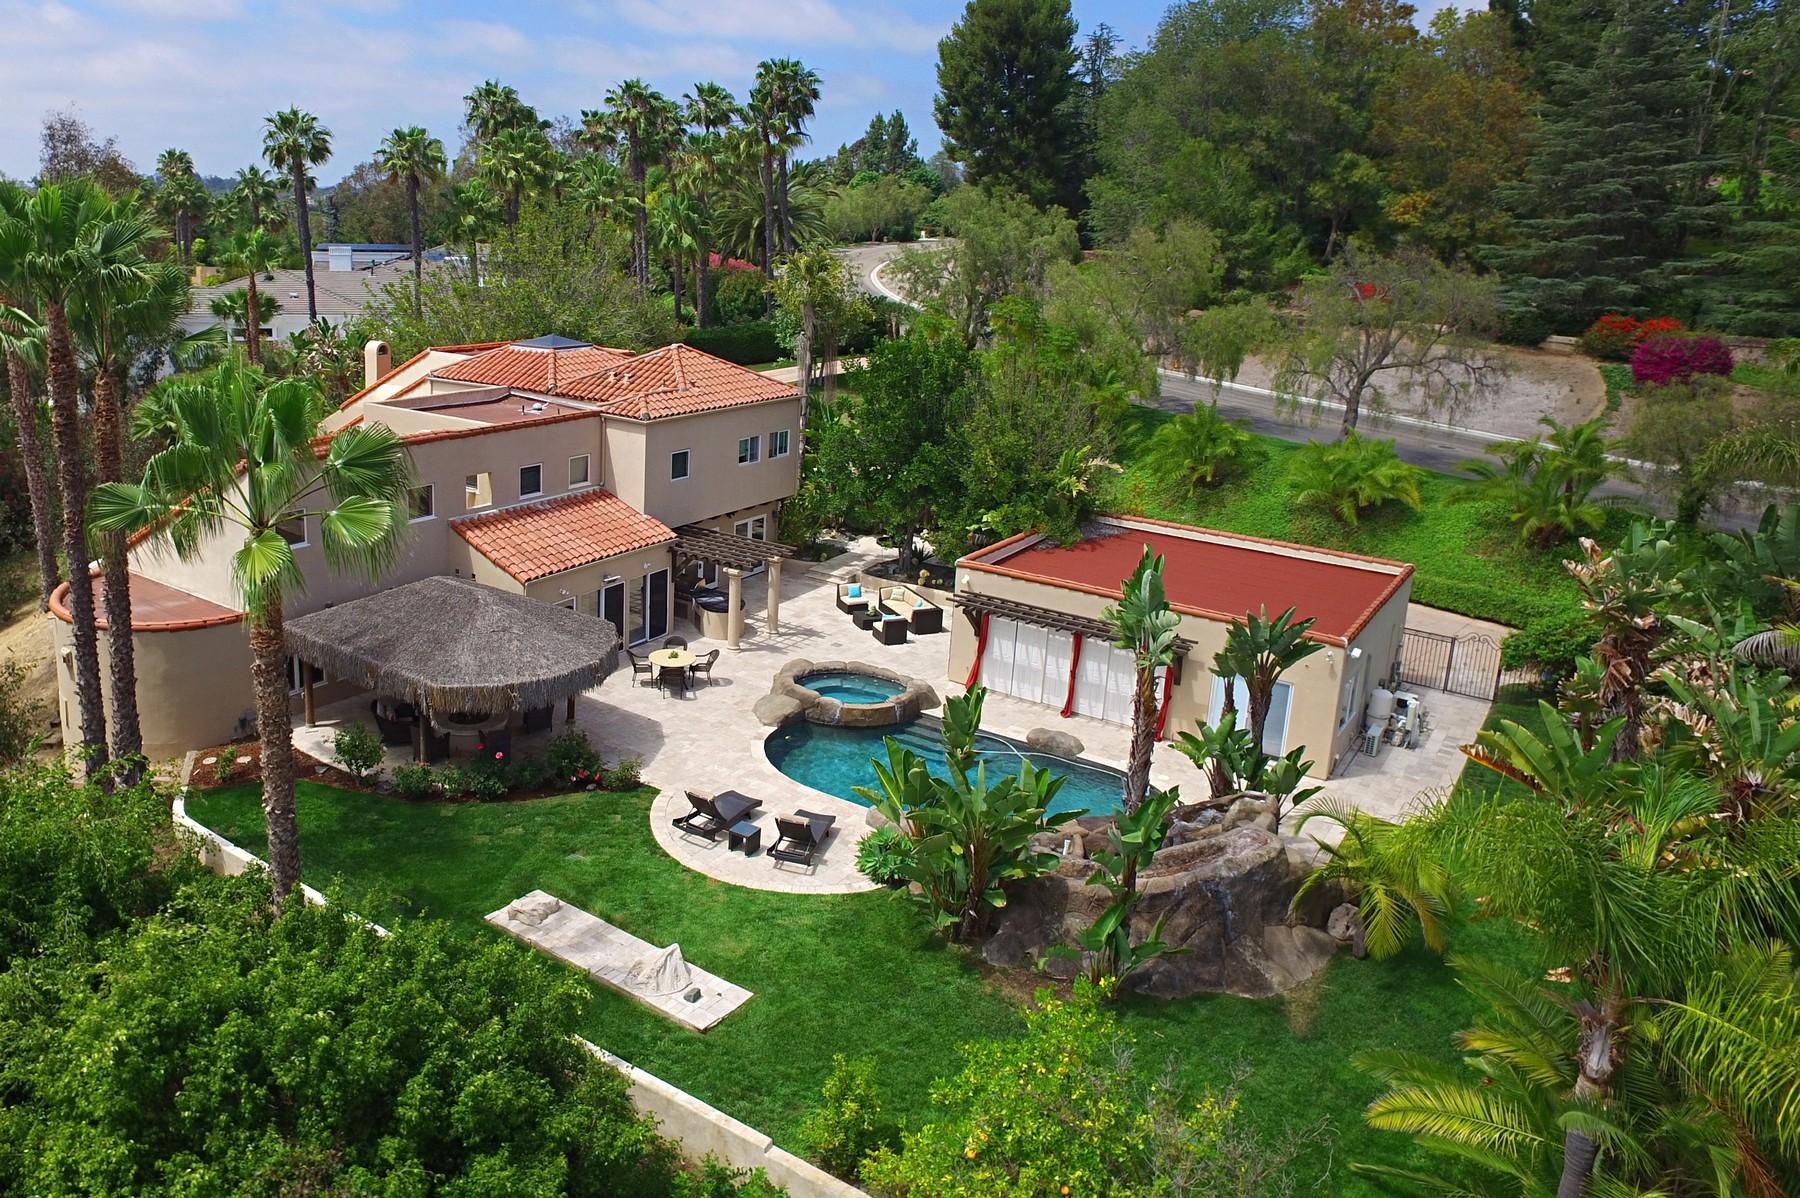 Single Family Home for Sale at 17680 Circa Oriente Rancho Santa Fe, California, 92067 United States